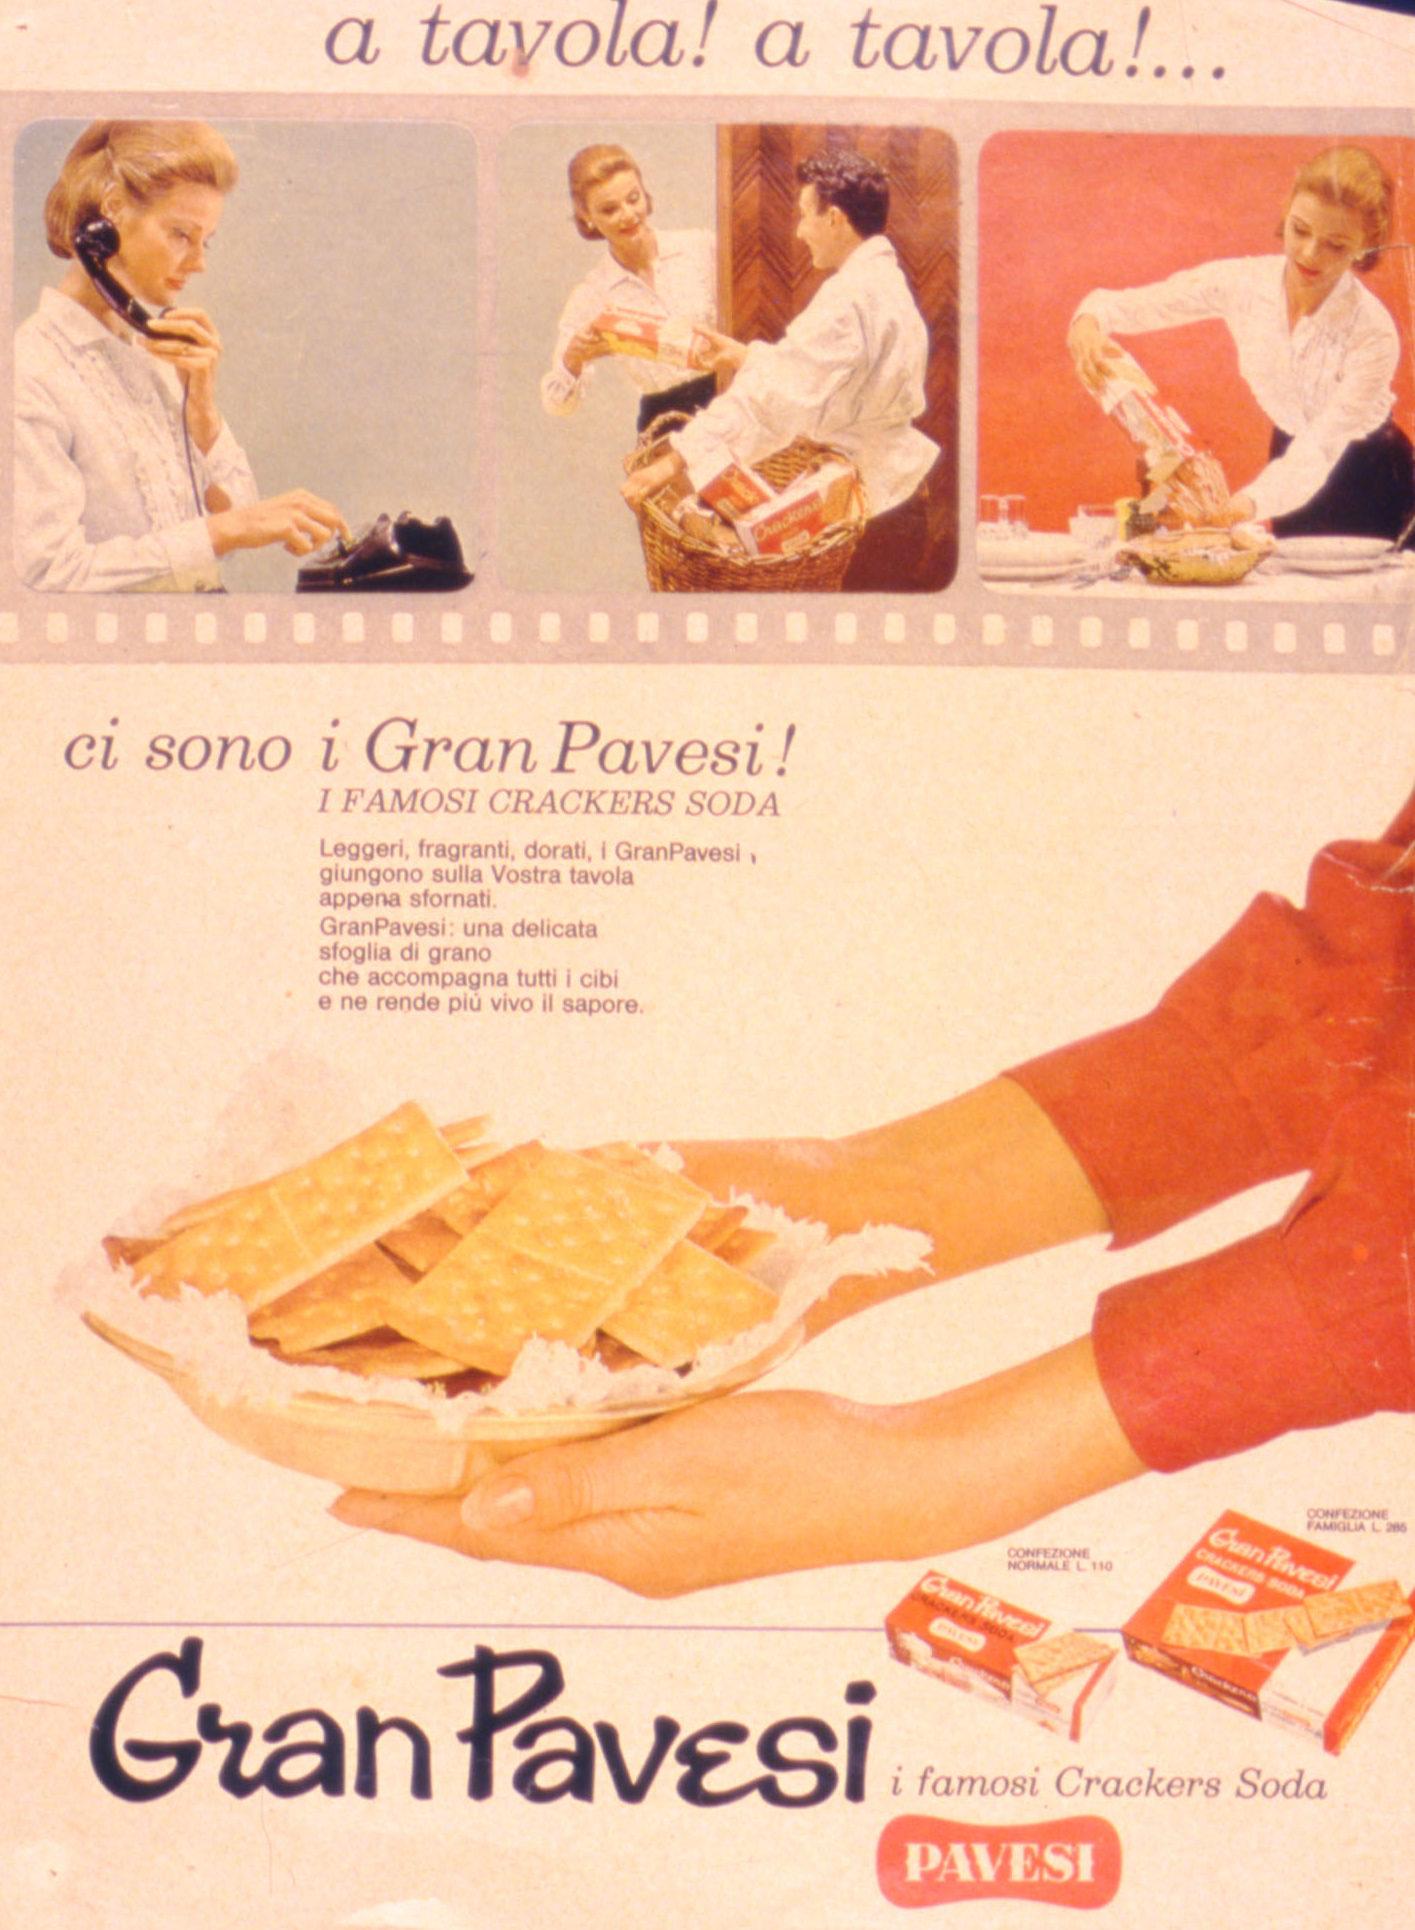 Press advertising Gran Pavesi Crackers, 1962-1963